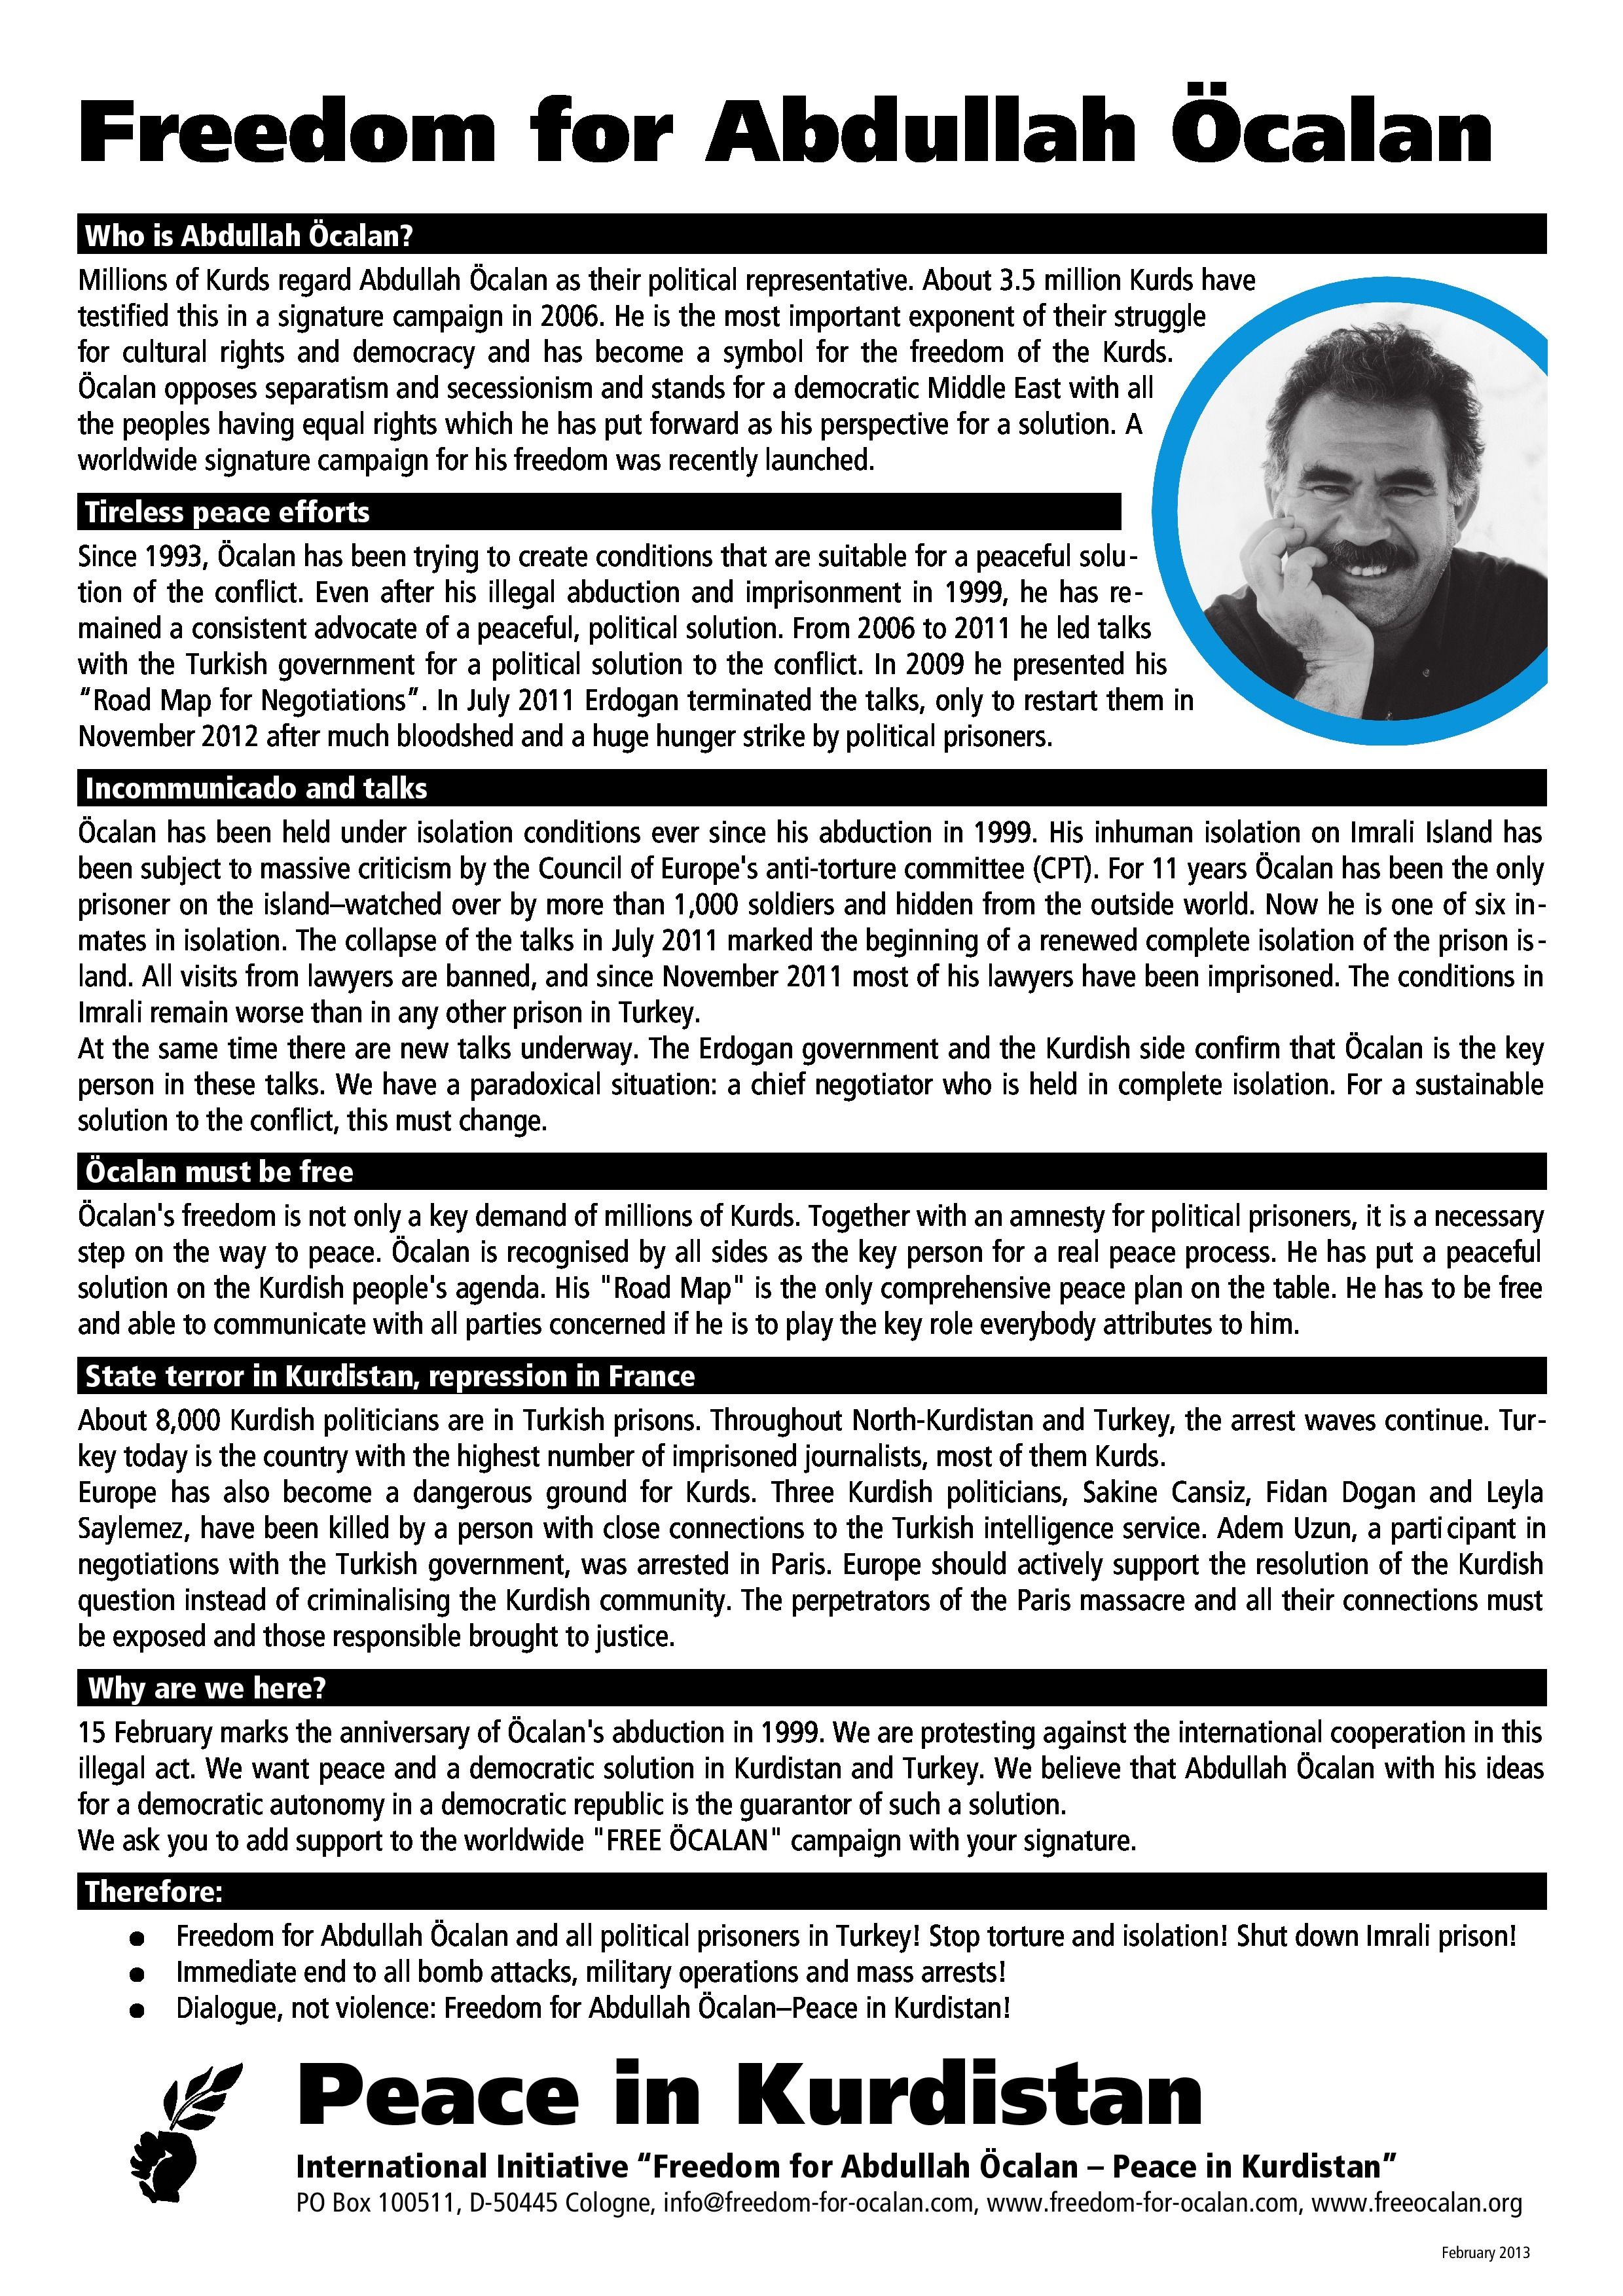 Freedom for Ocalan leaflet